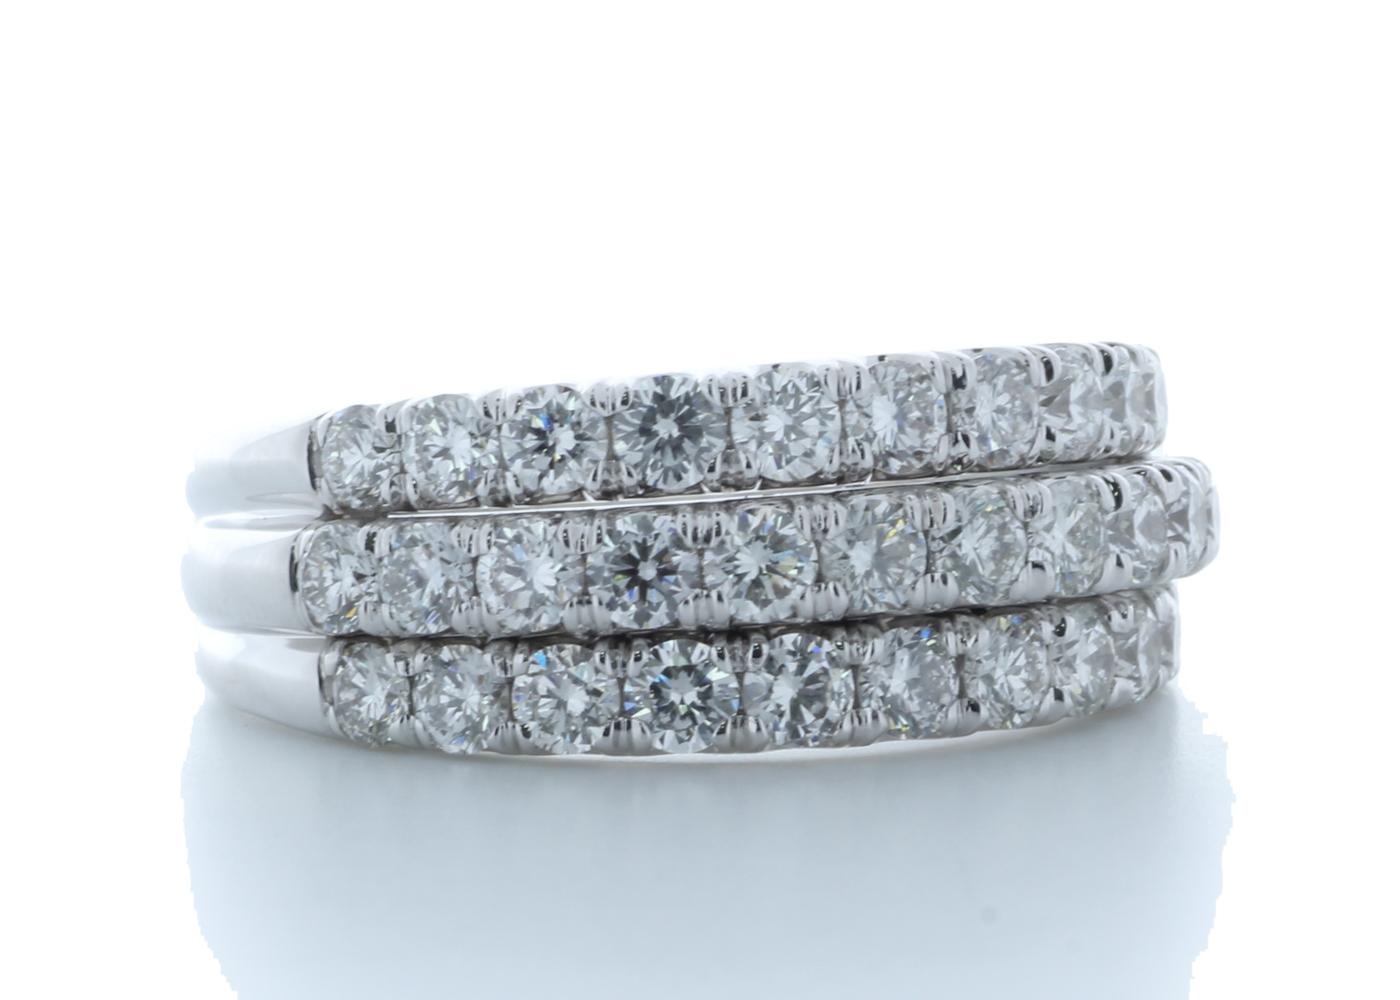 18k White Gold Channel Set Semi Eternity Diamond Ring 1.61 Carats - Image 4 of 4